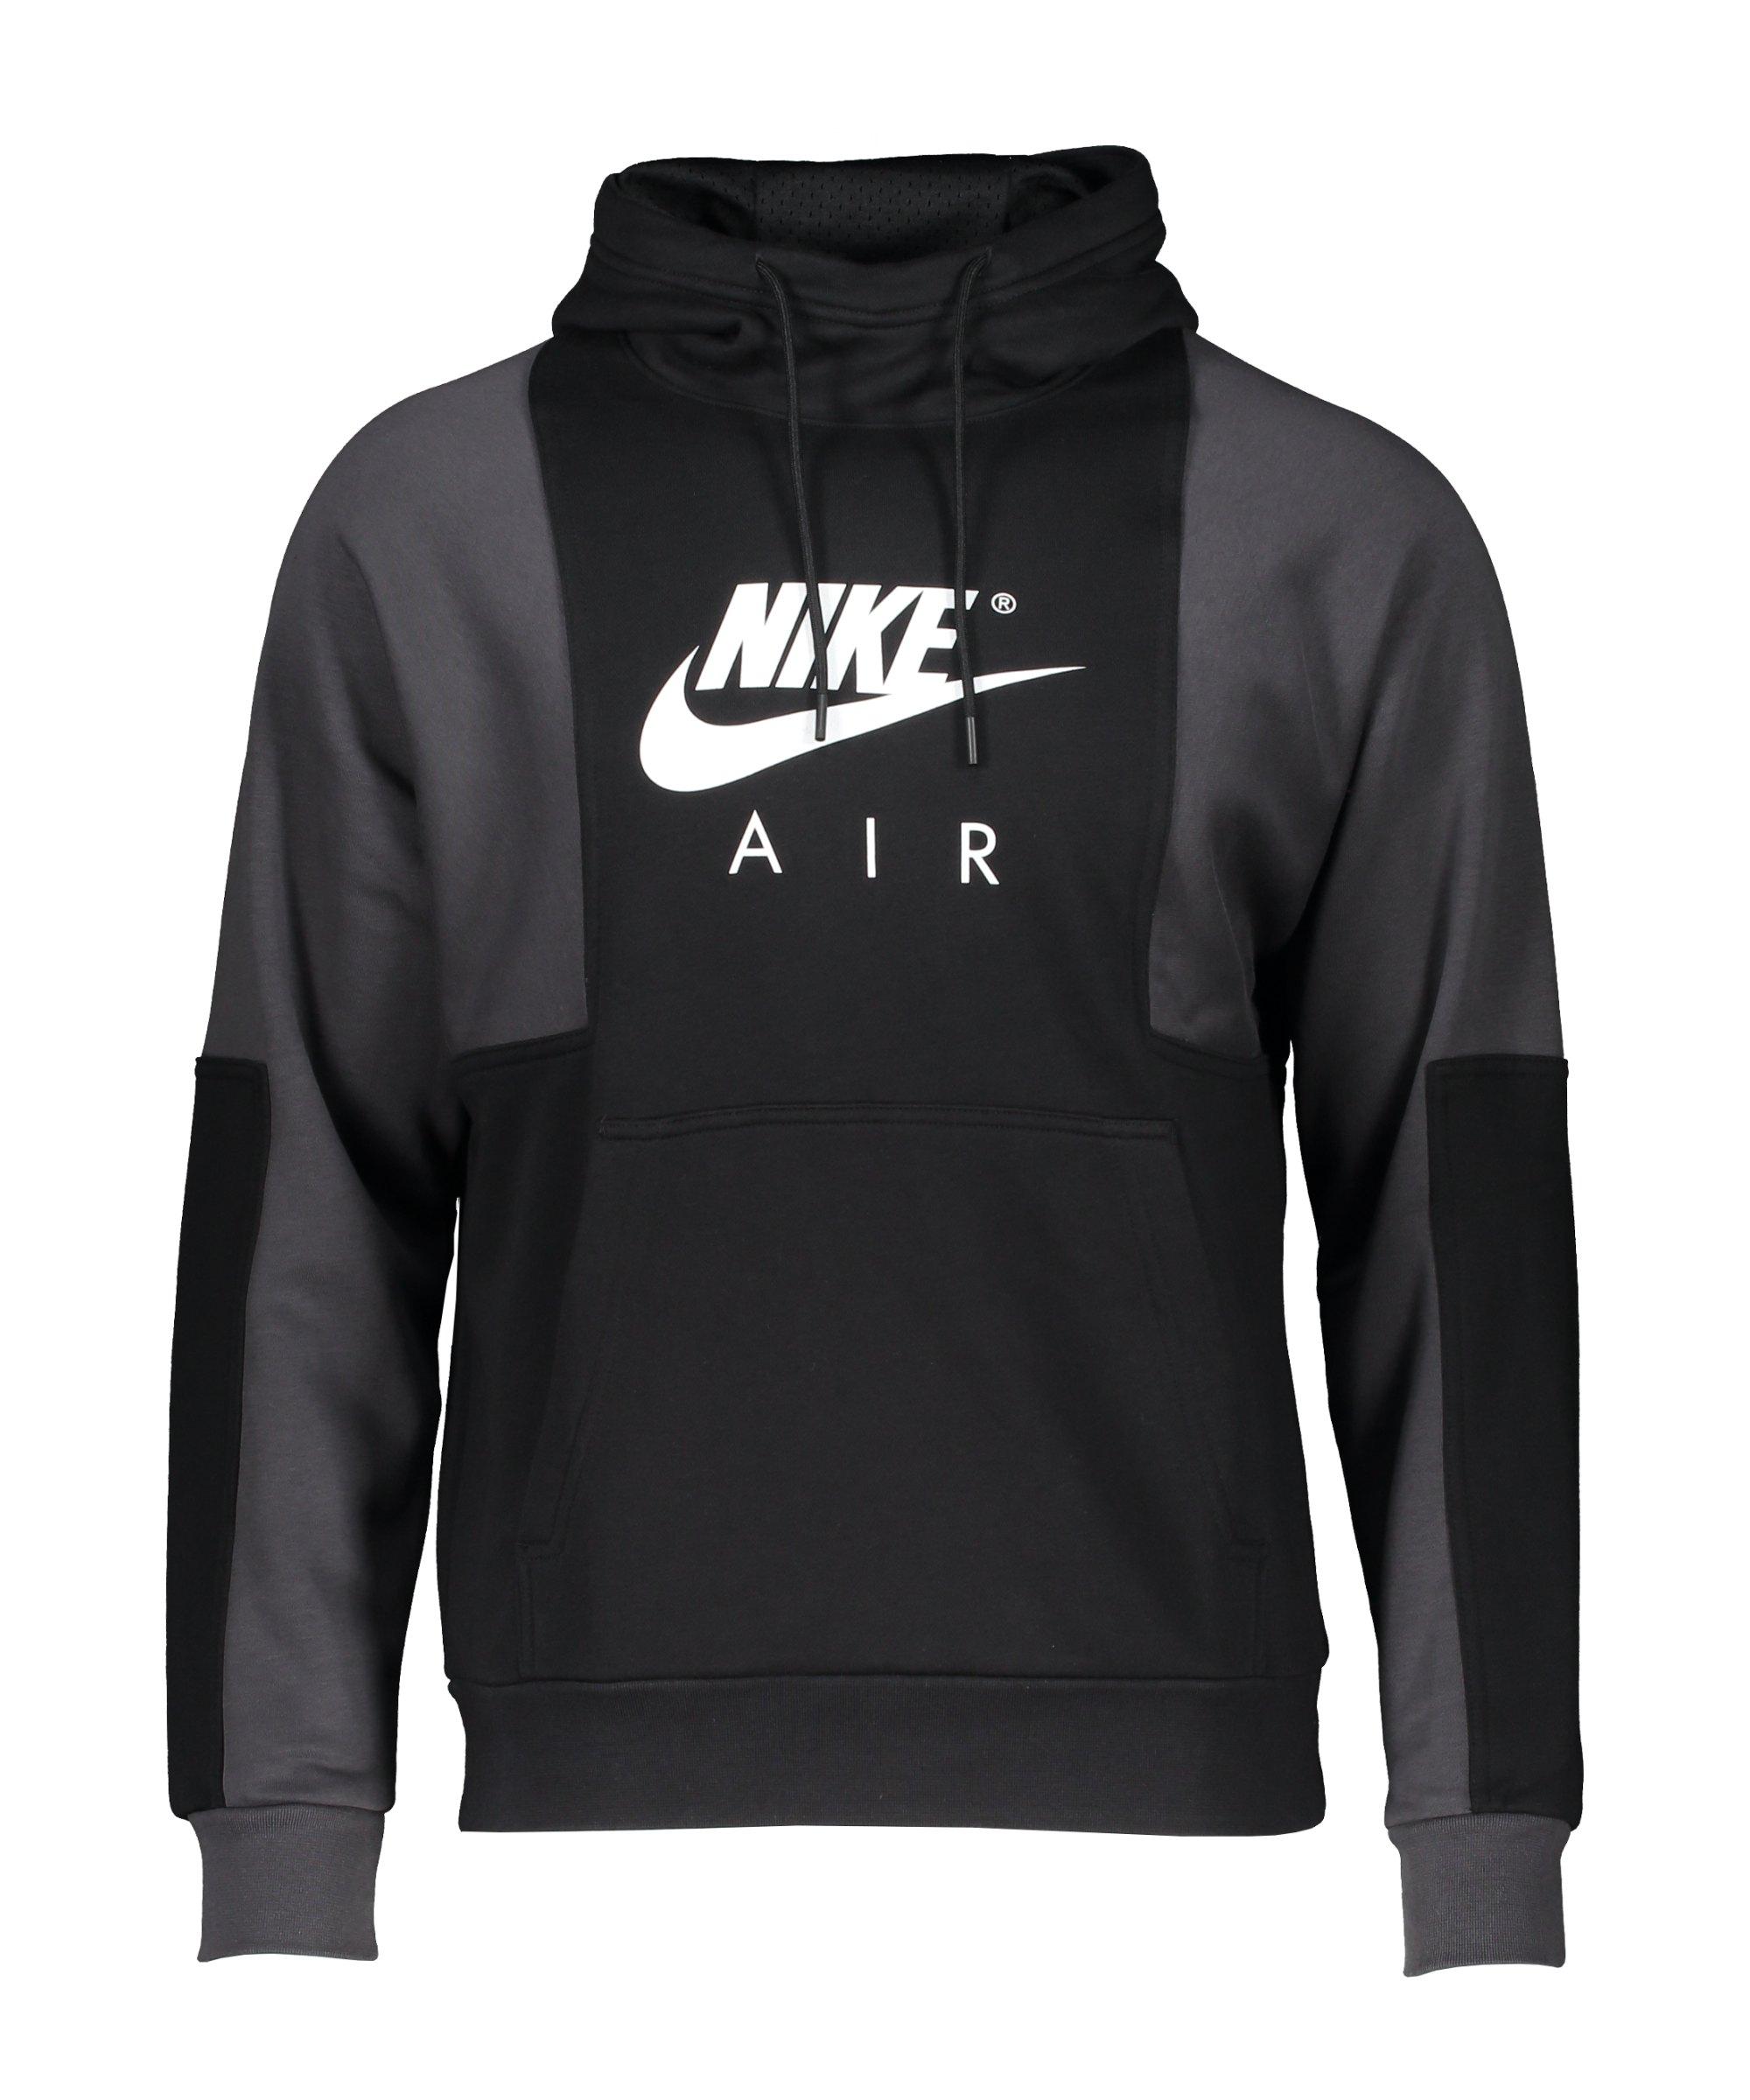 Nike Air Brushed-Back Fleece Hoody Schwarz F010 - schwarz